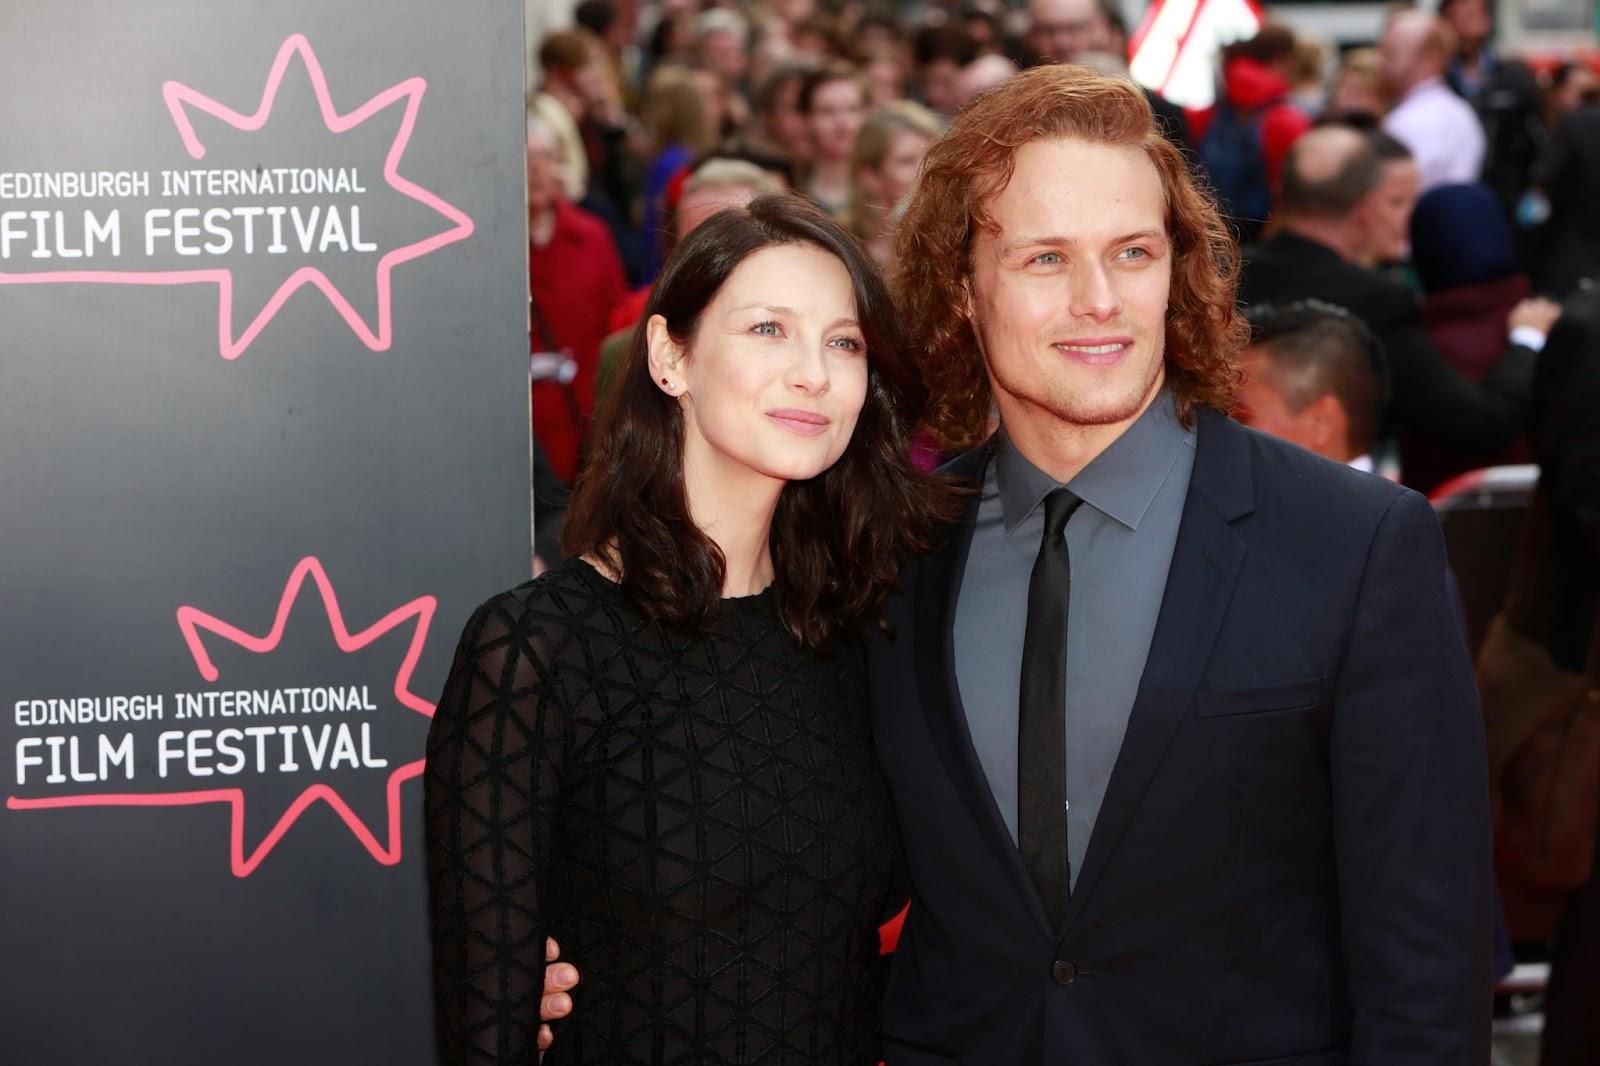 Outlander stars dating 2015